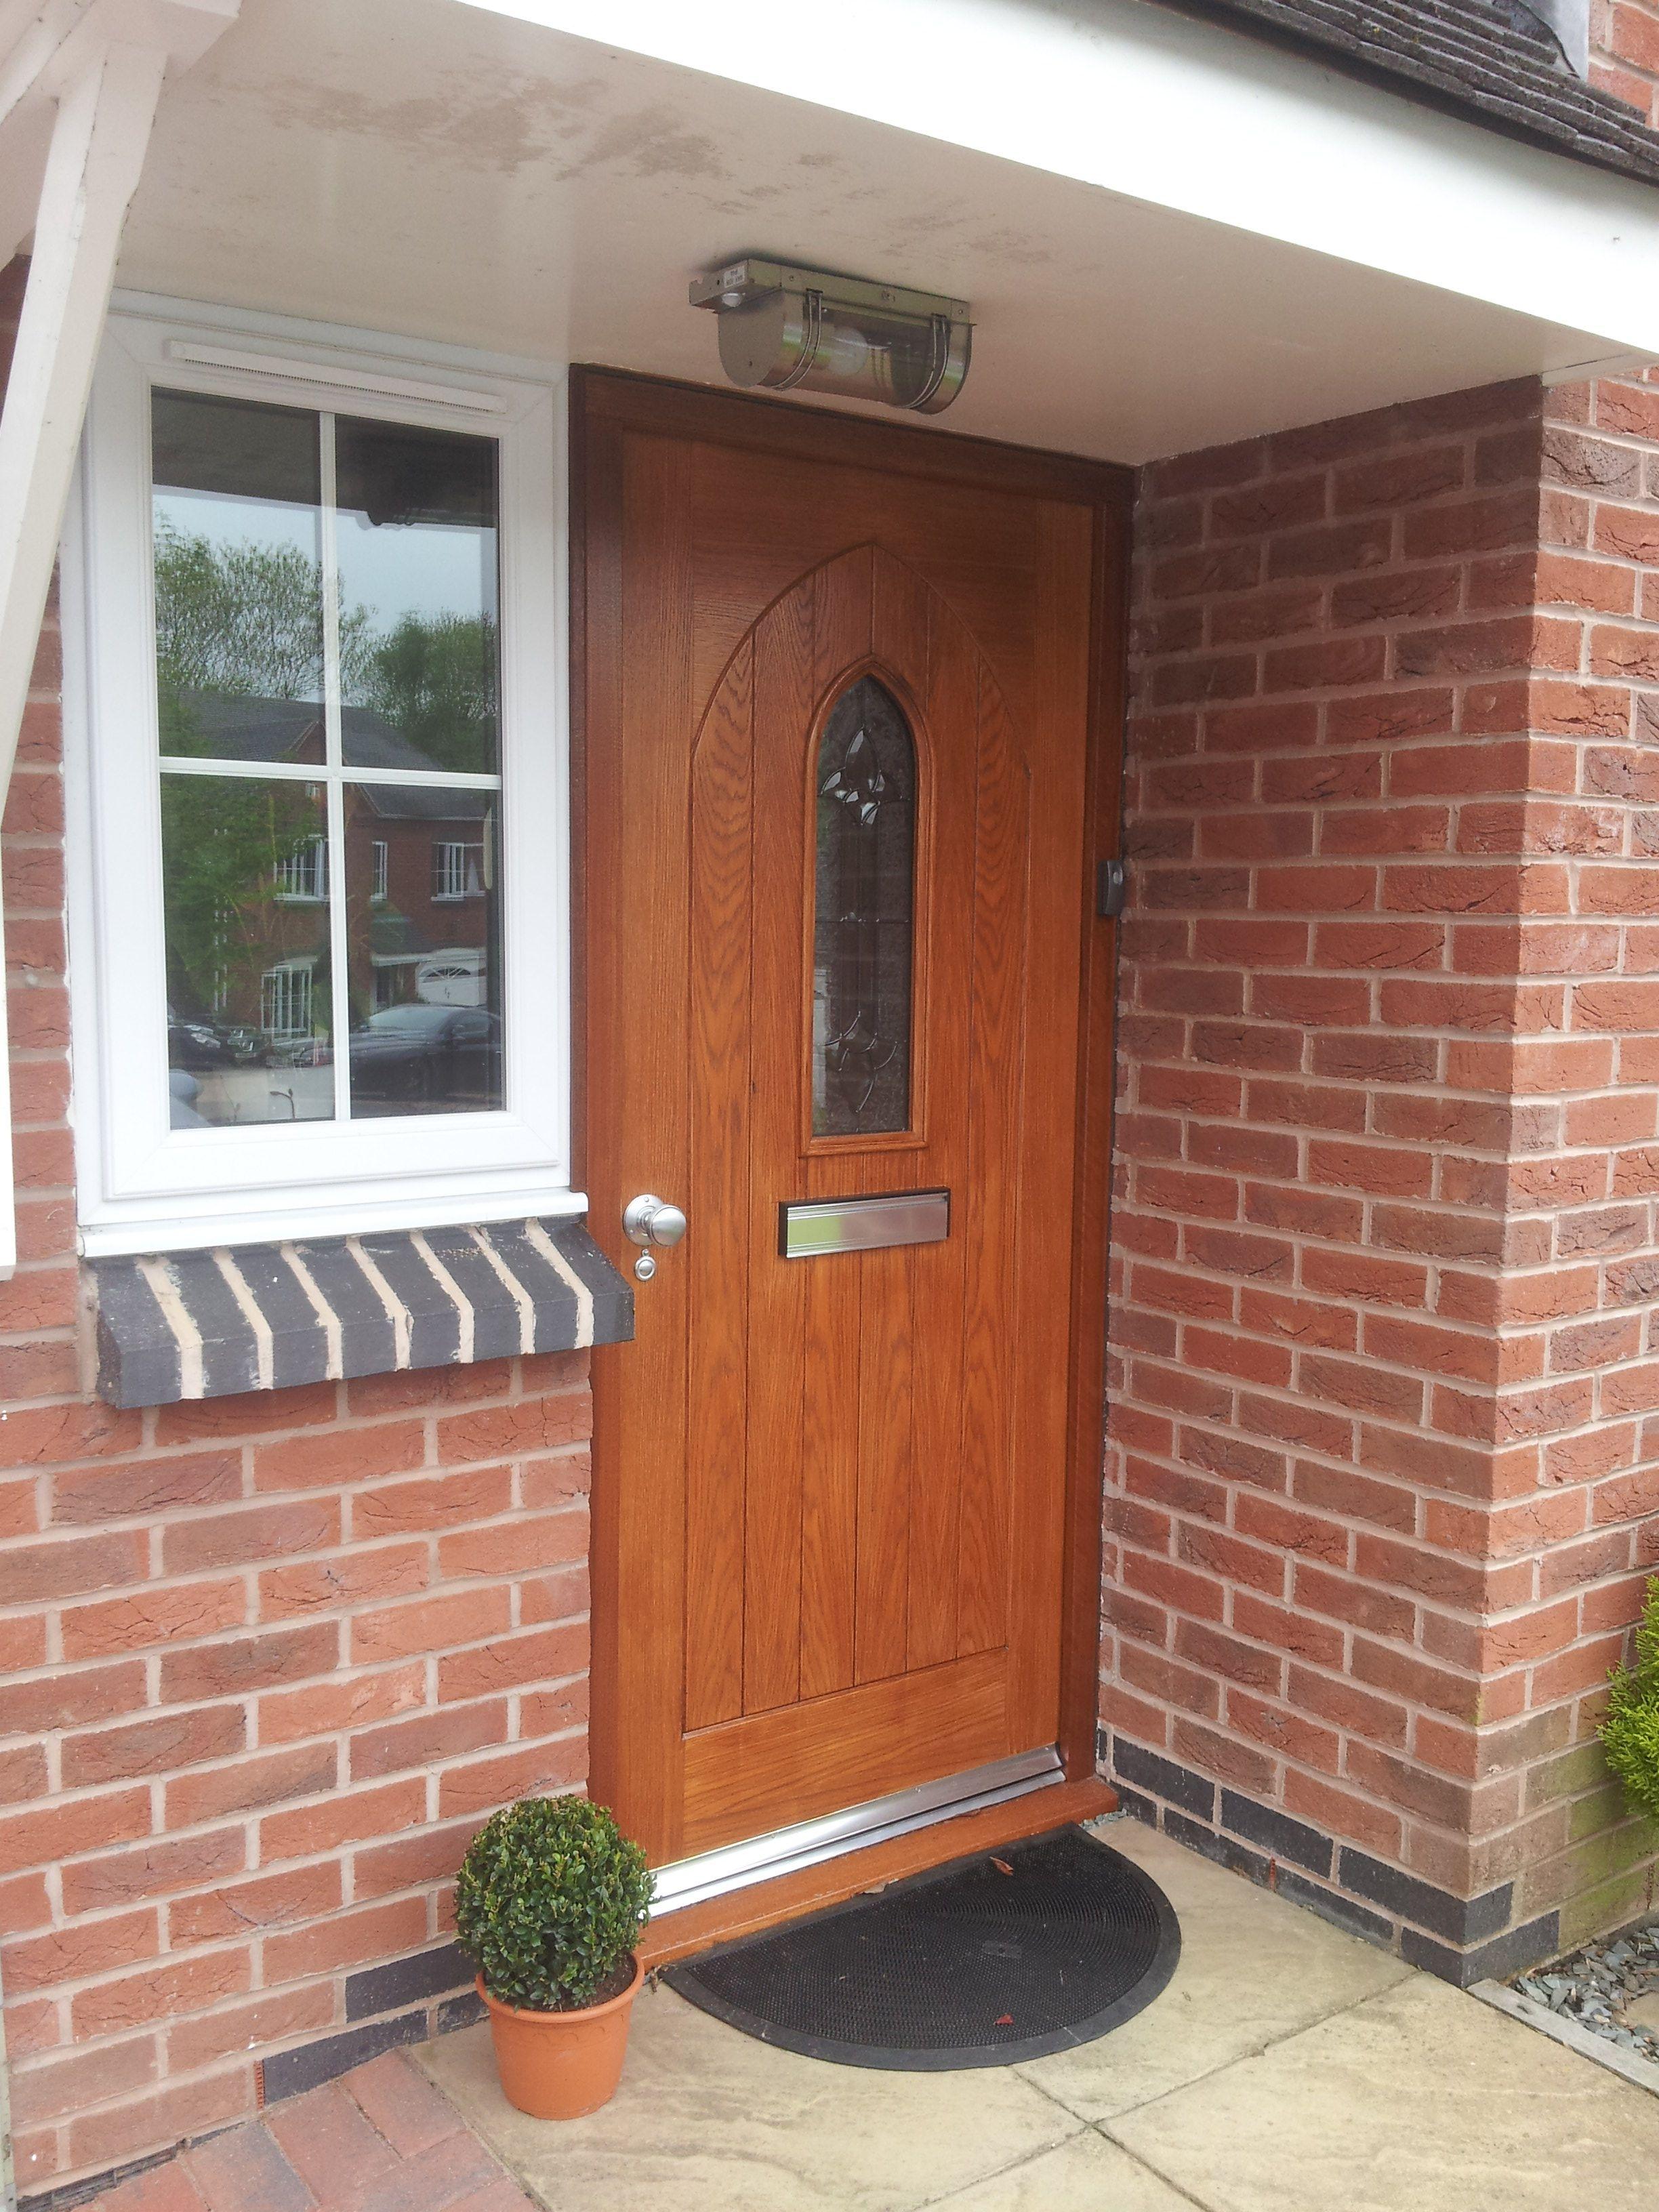 Oak Westminster Door Finished With Sikkens Light Oak Cetol 7 Staining Wood Outdoor Decor Light Oak